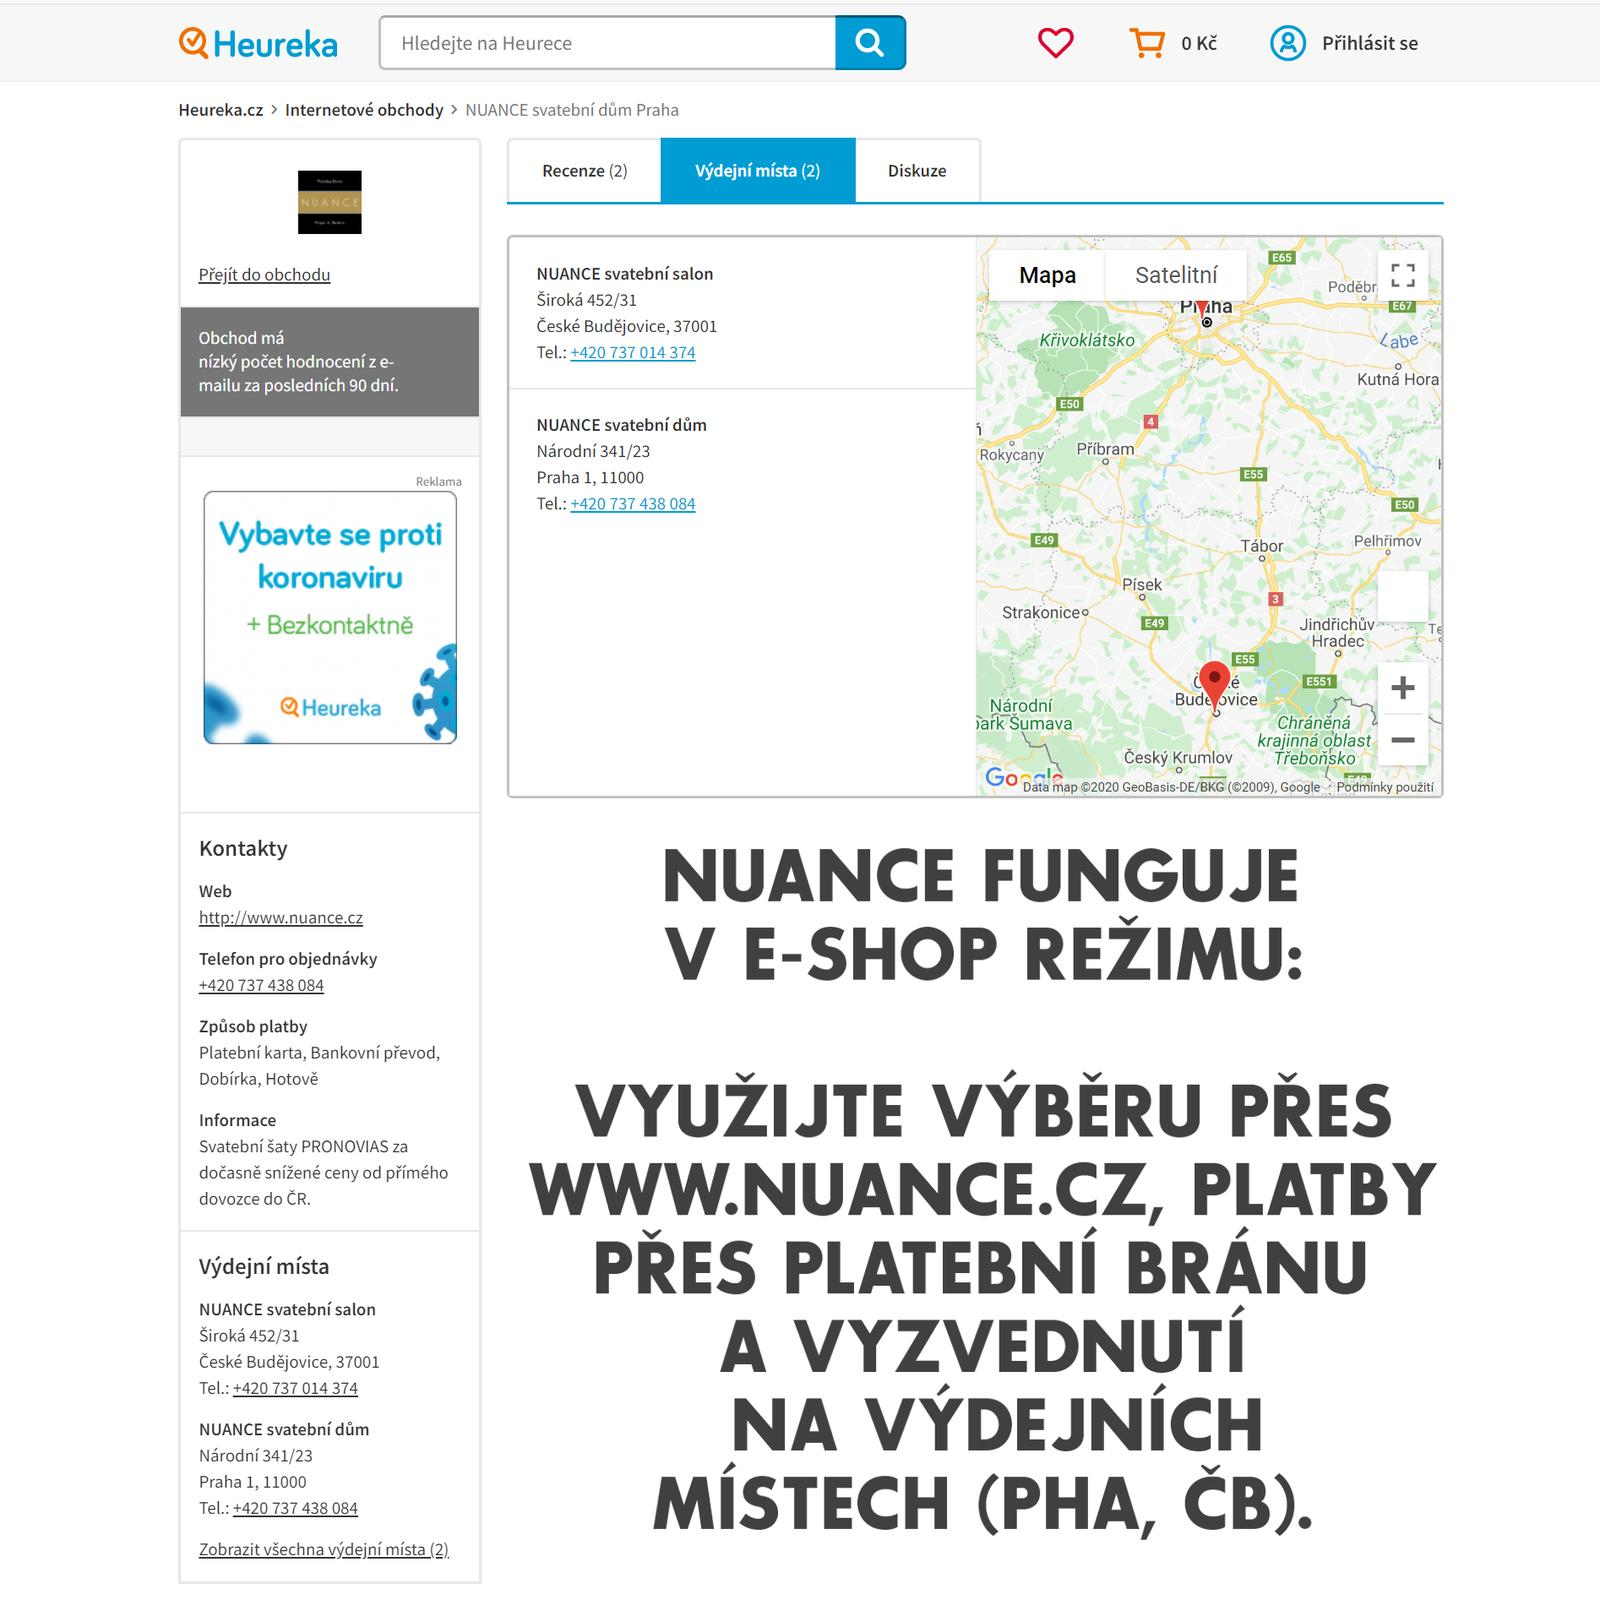 Postaráme se o Vás - koronavirus - https://www.nuance.cz